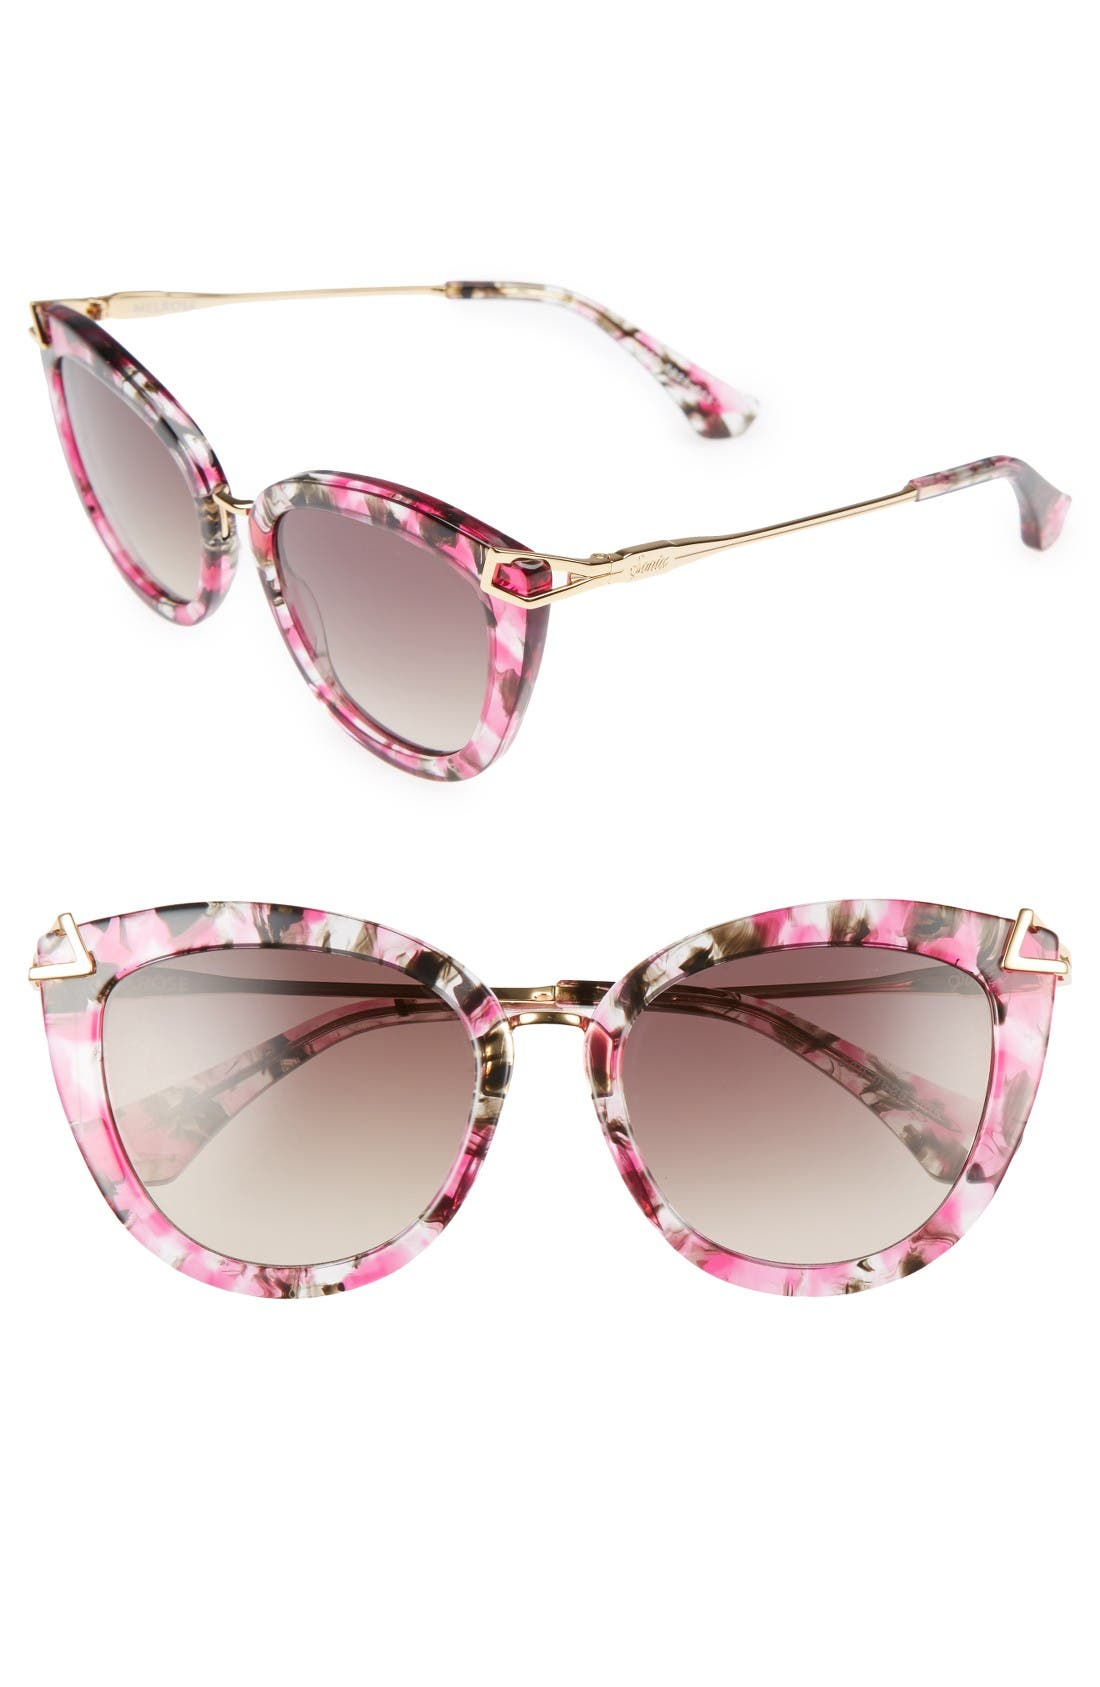 SONIX Melrose 51mm Cat Eye Sunglasses